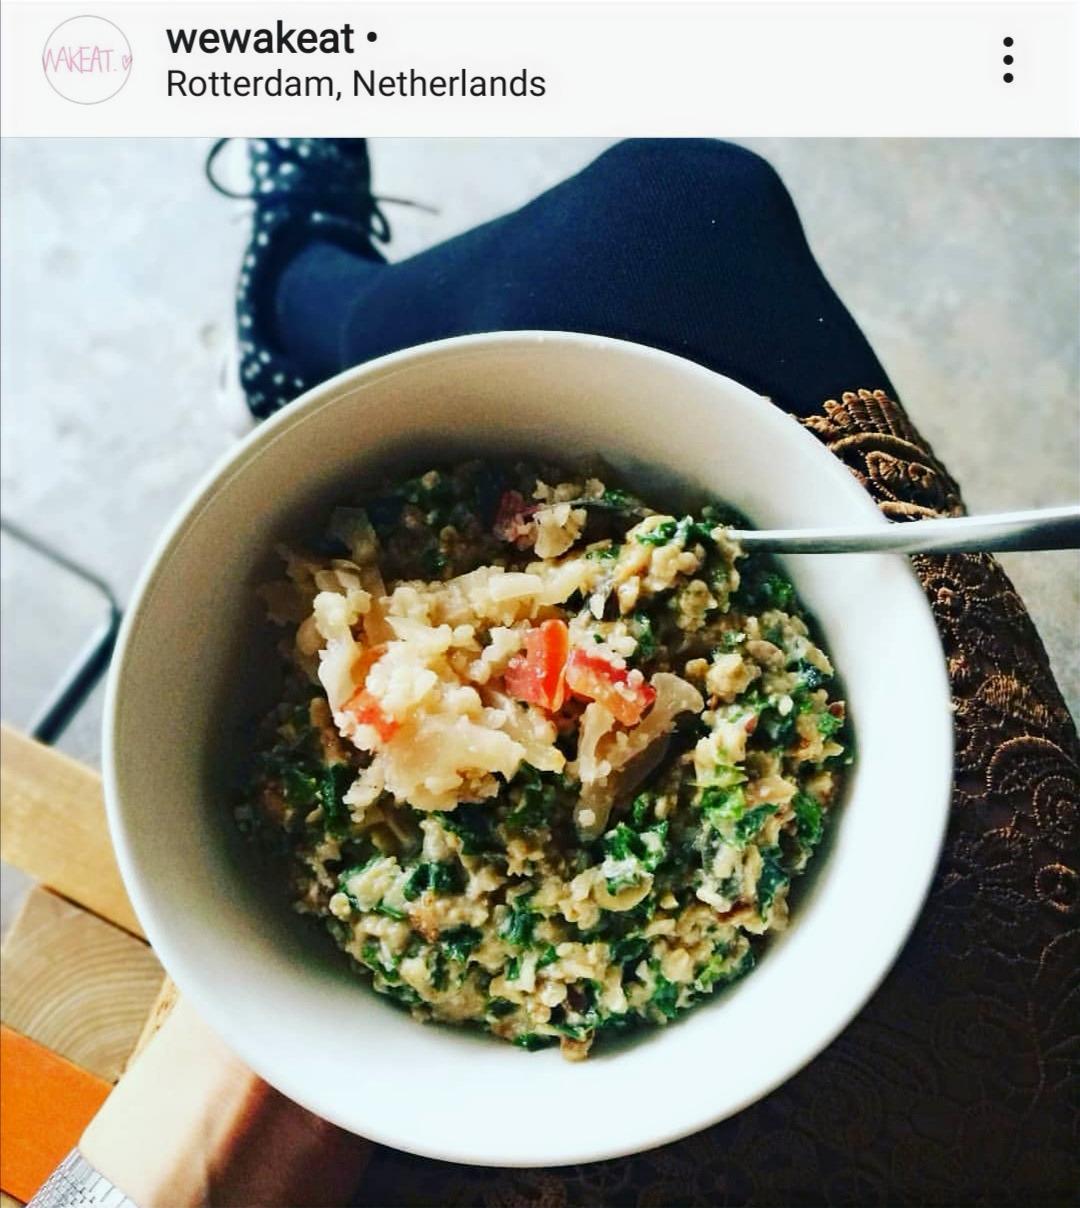 Easy-peasy JP style savory oats porridge